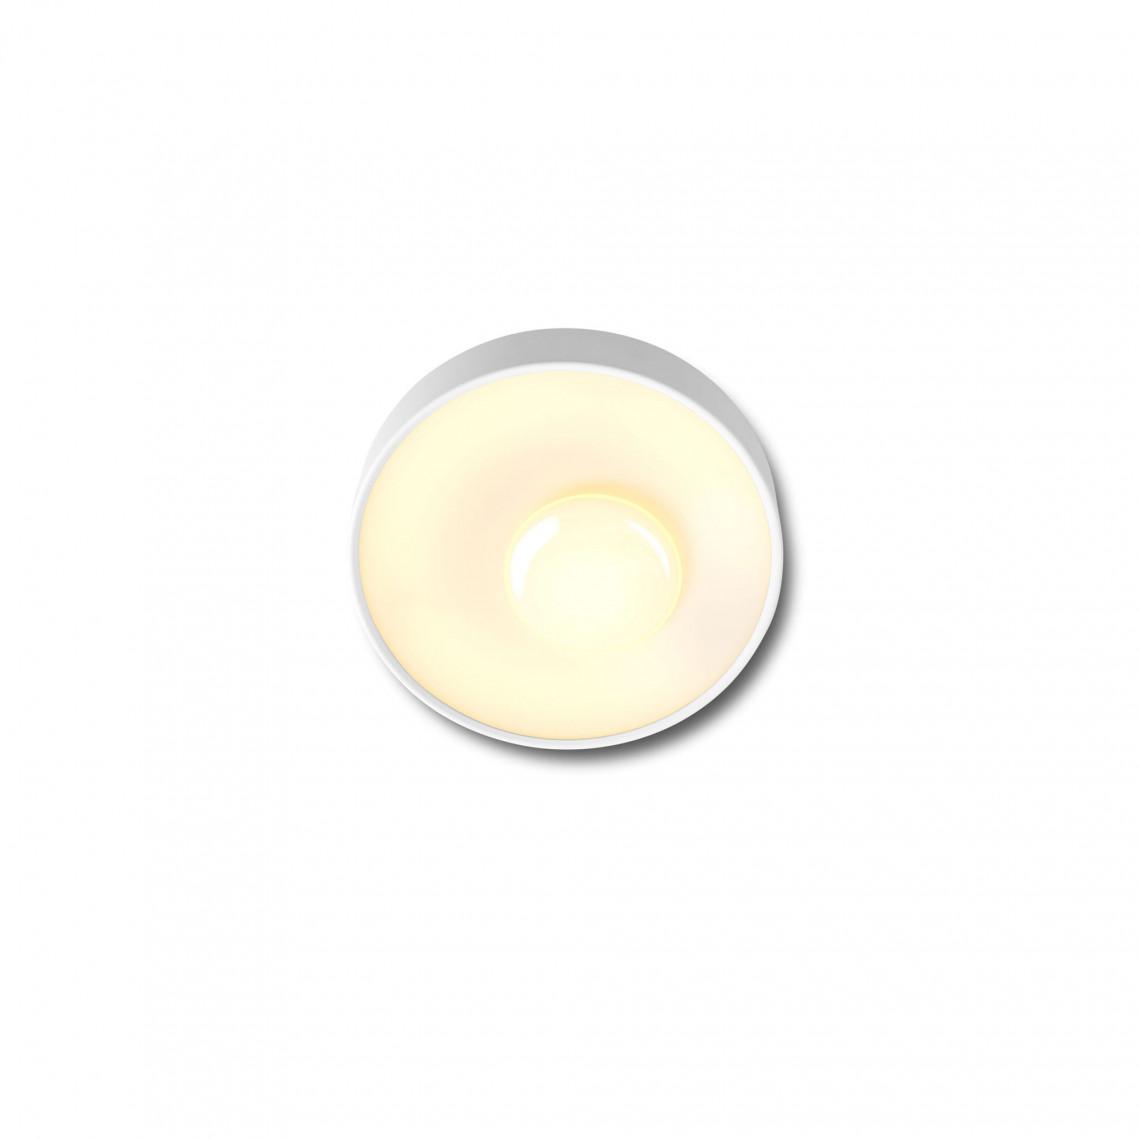 Sun - Ceiling Lamp White